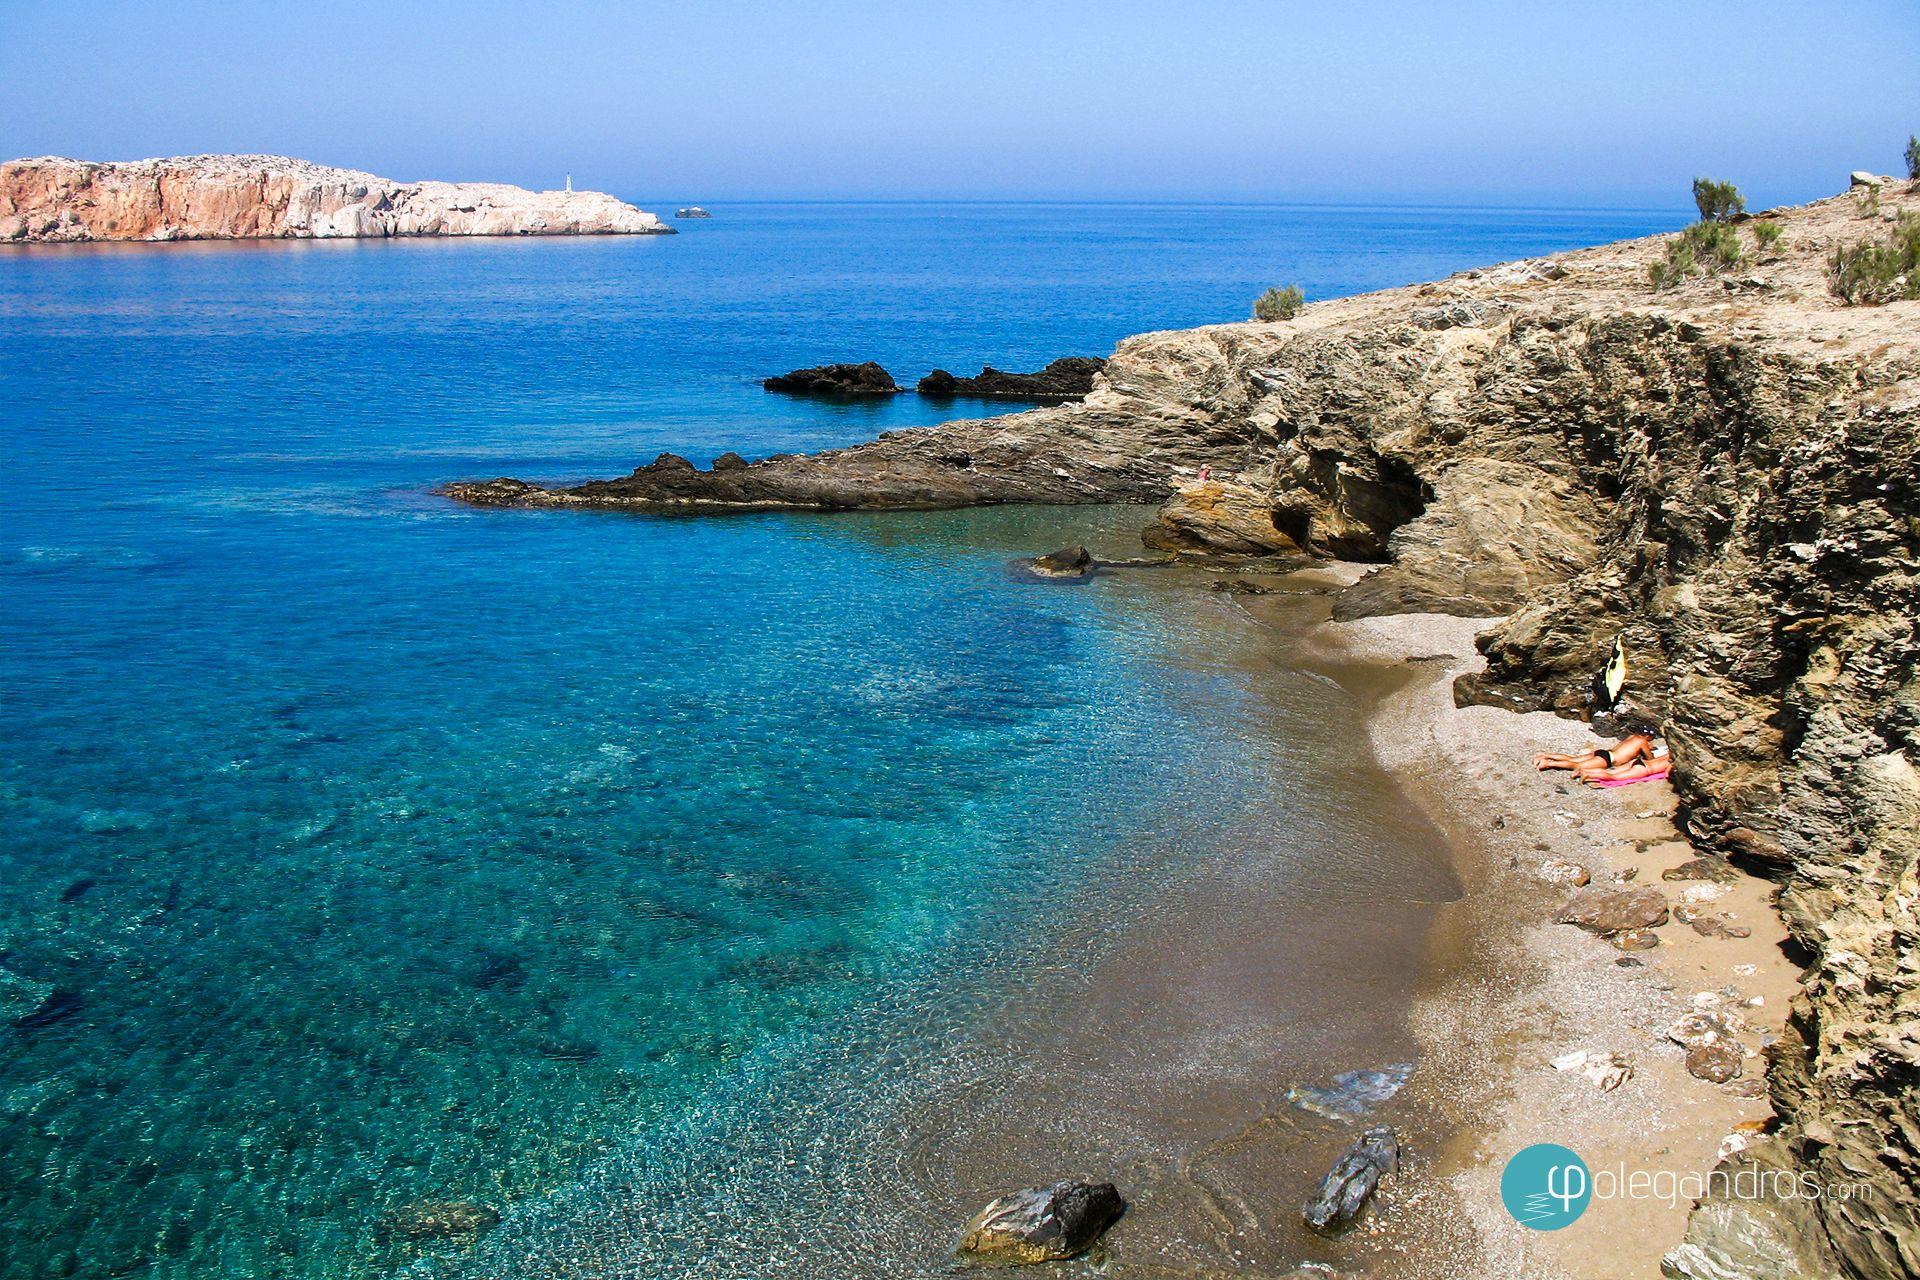 Latinaki beach, Folegandros